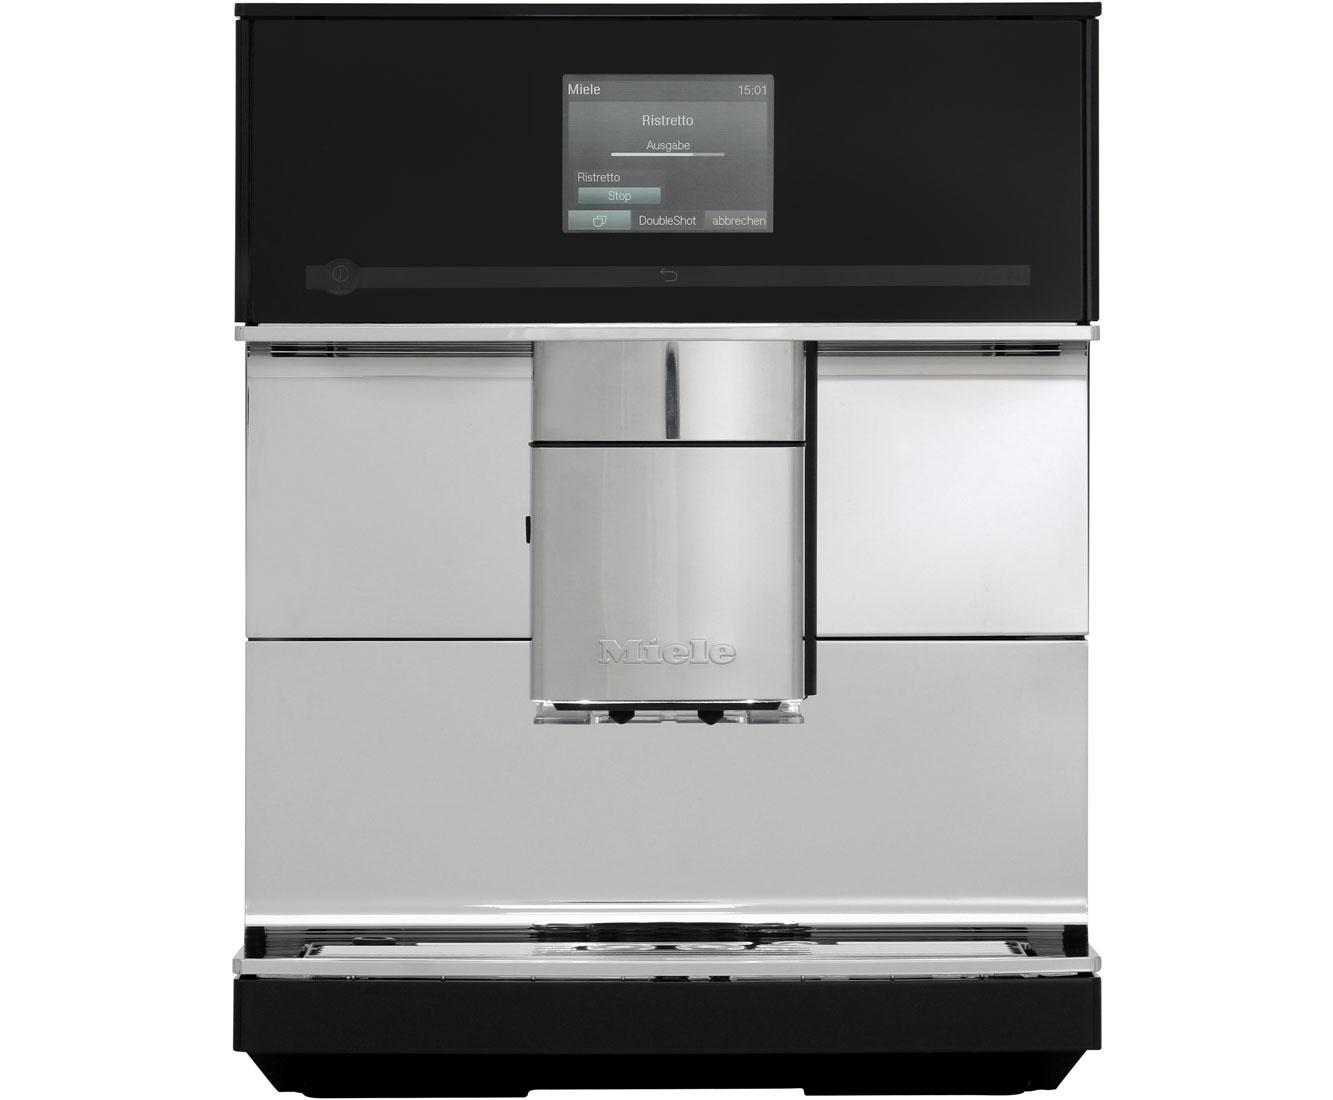 CM 7500 Kaffeemaschinen - Schwarz